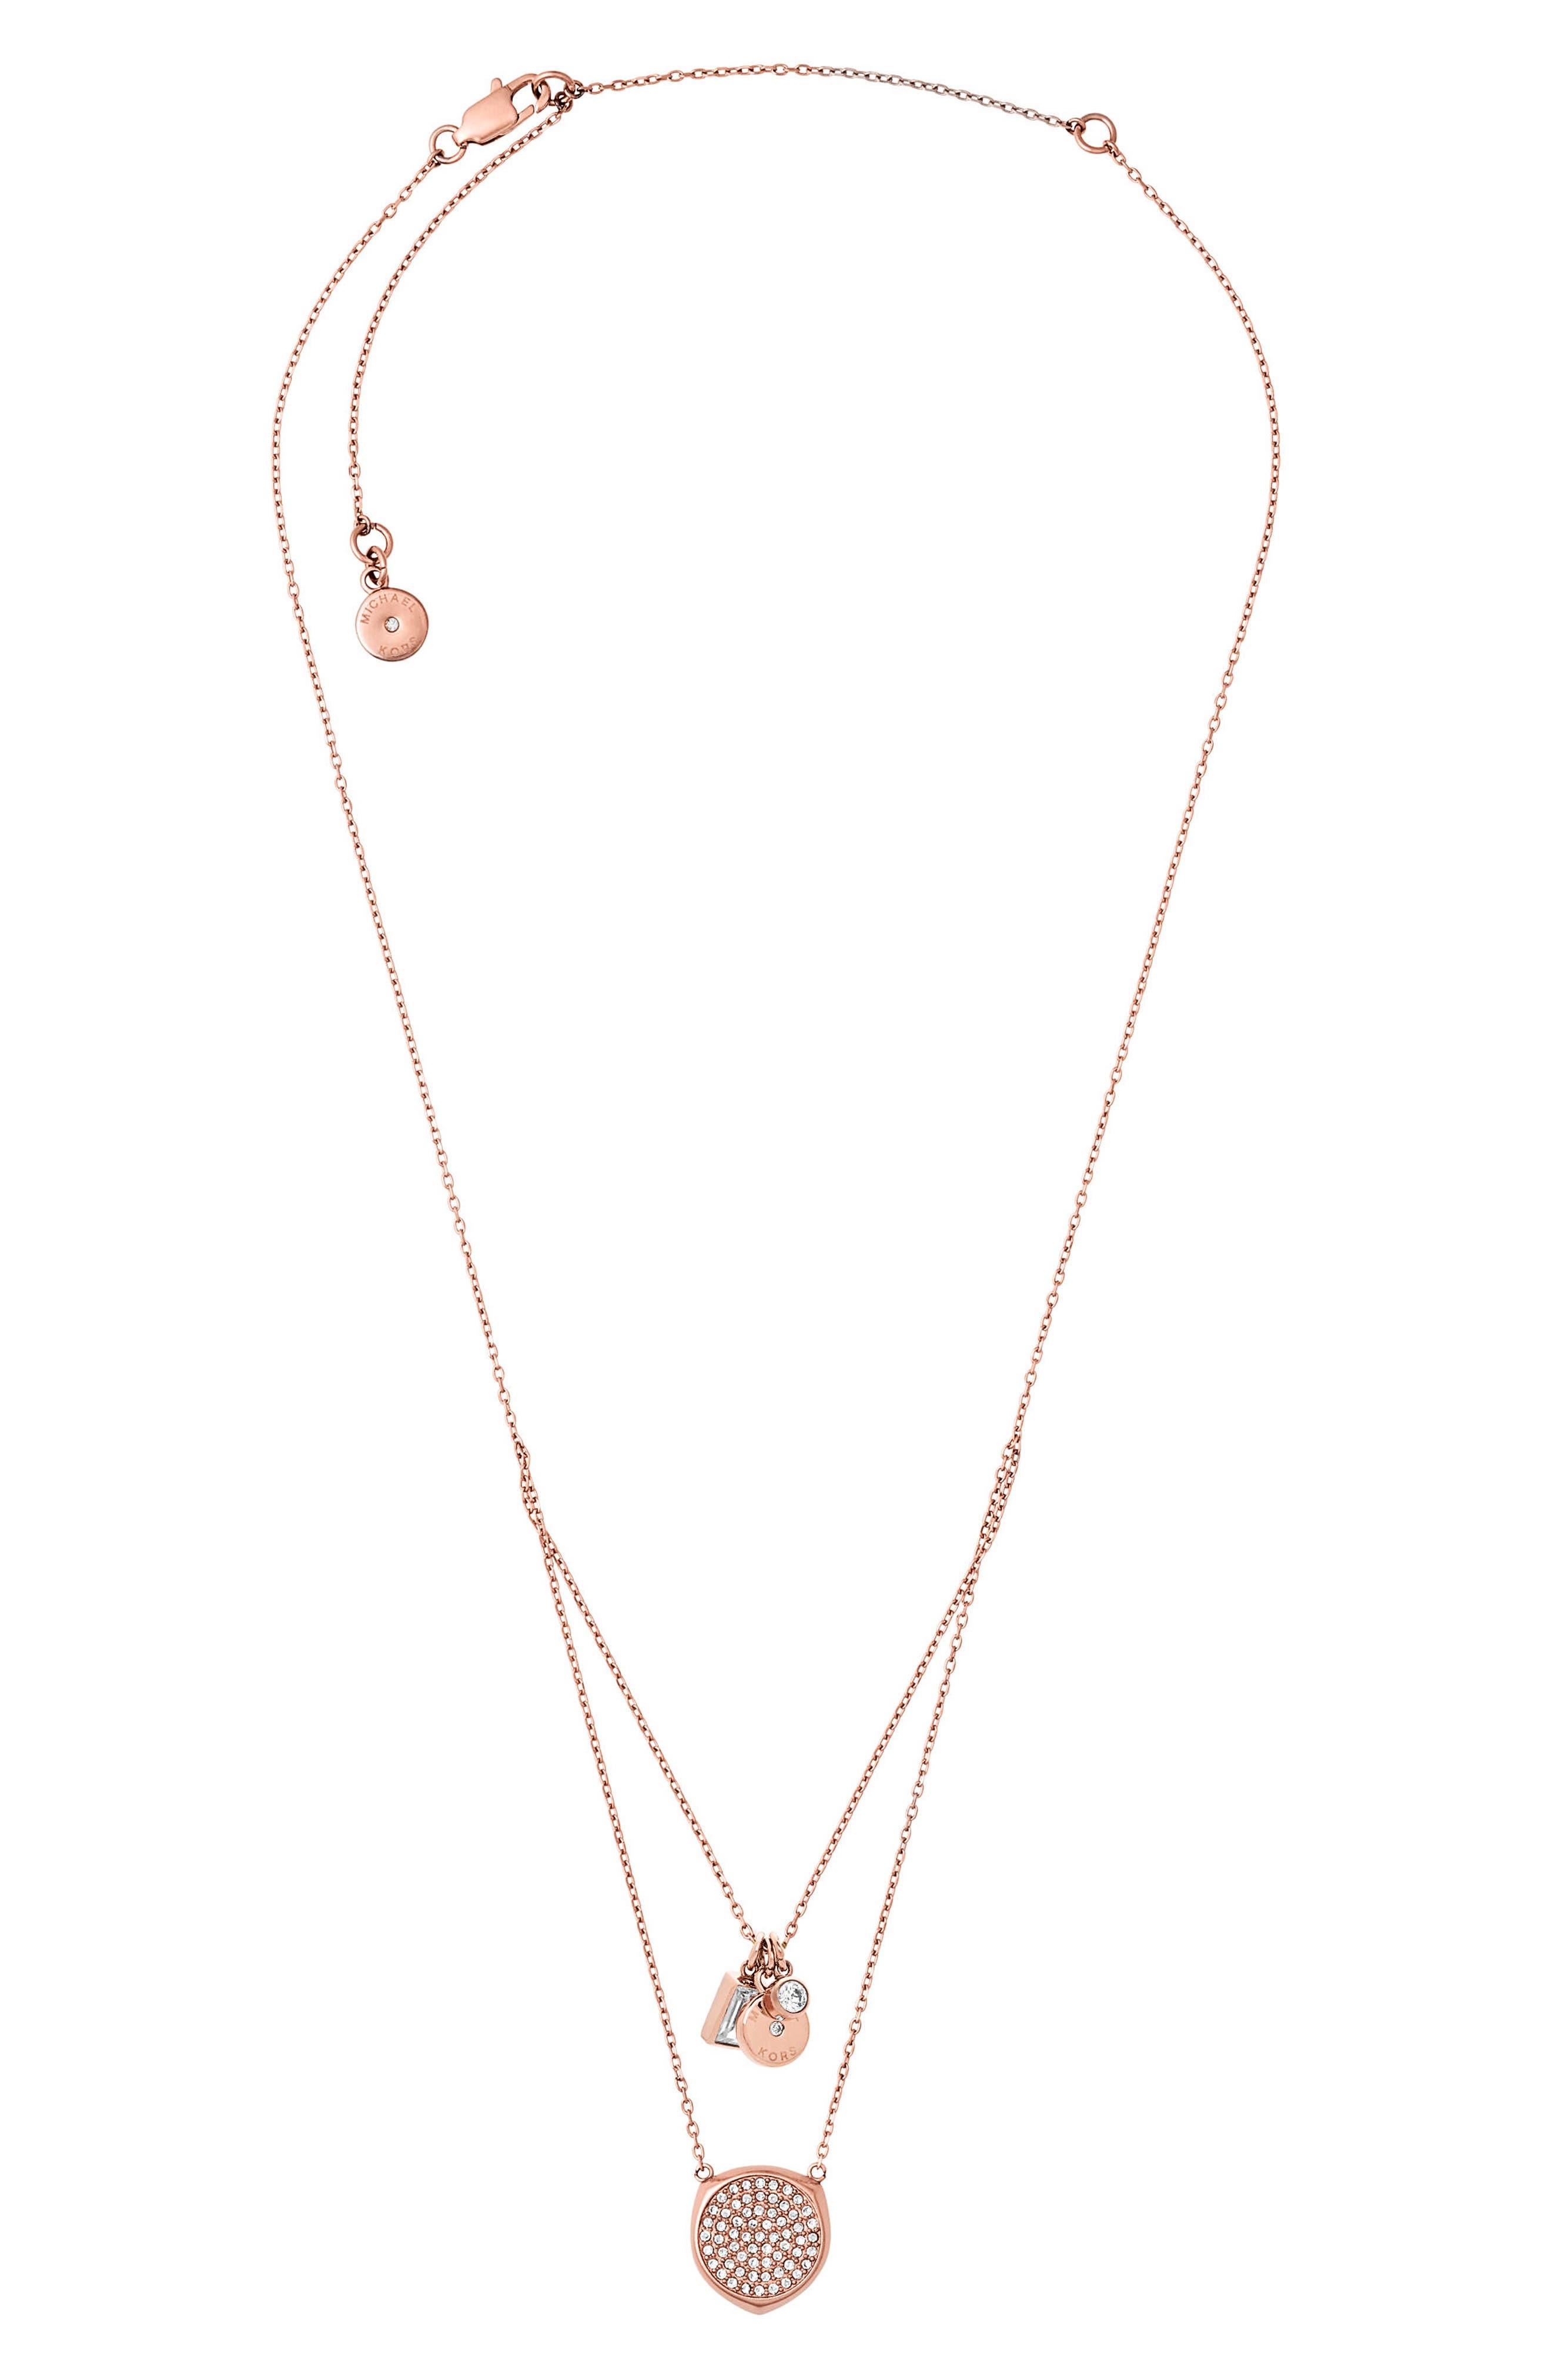 Charm Pendant Necklace,                             Main thumbnail 1, color,                             Rose Gold